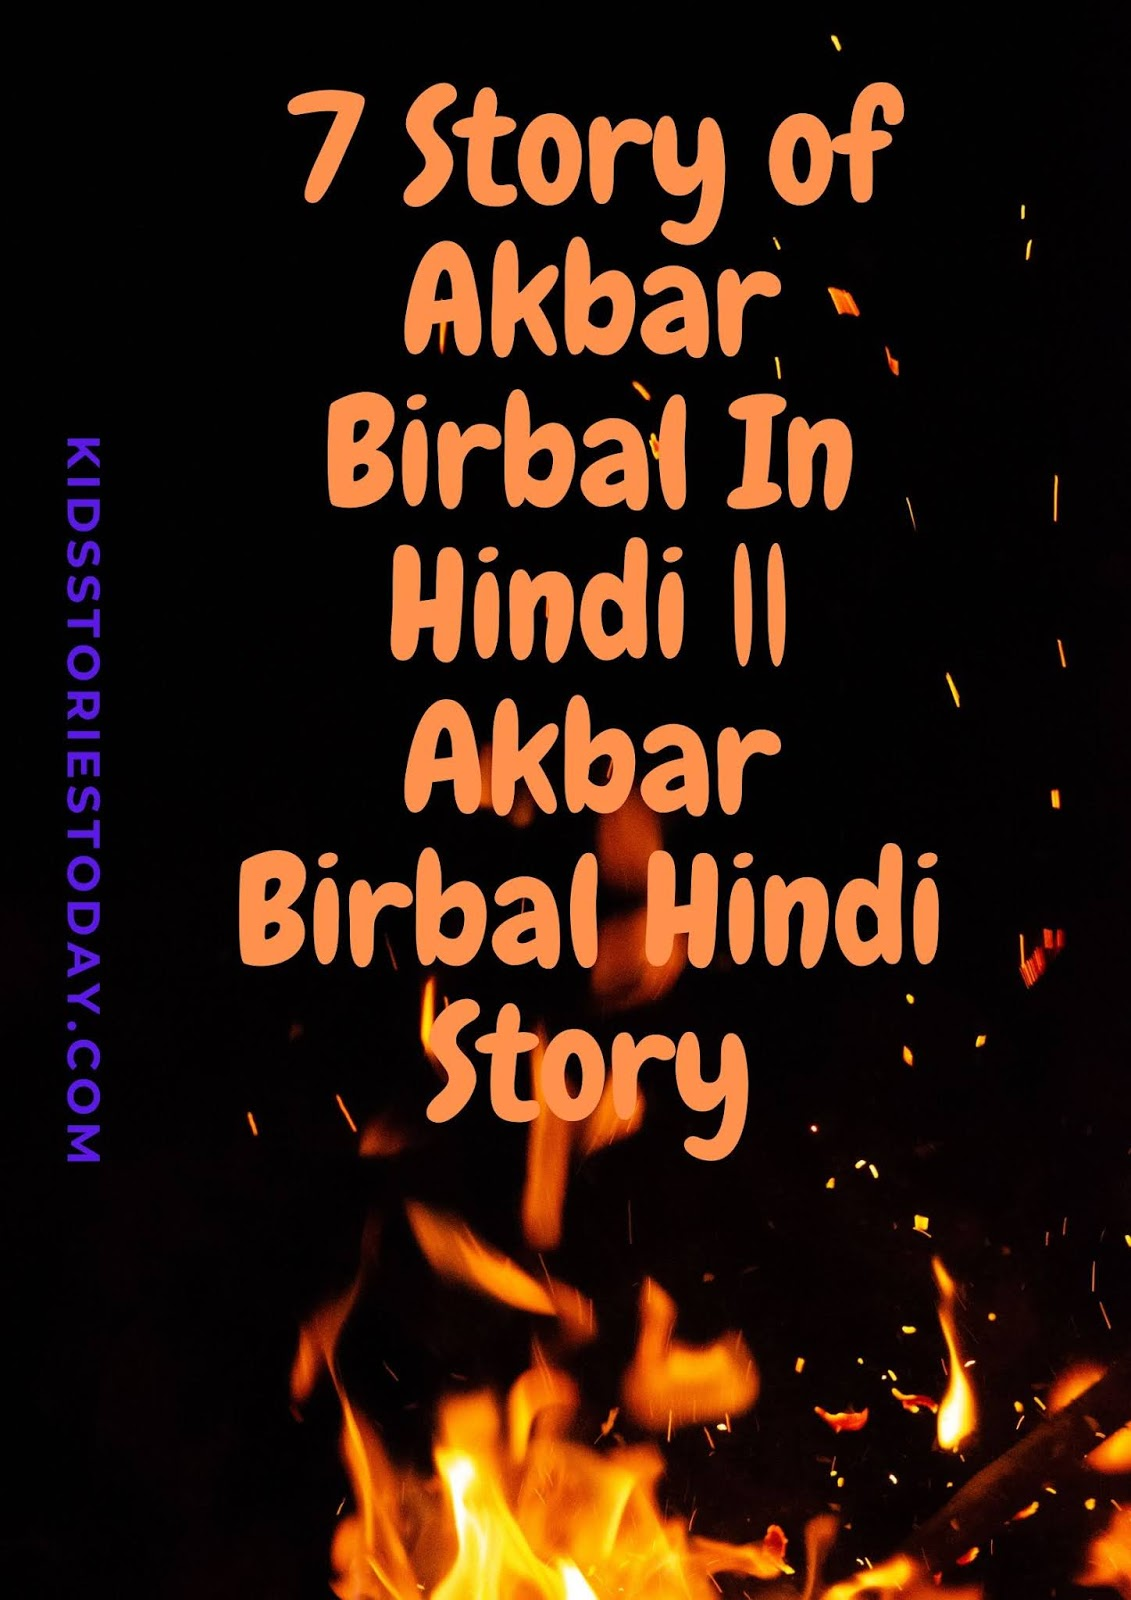 Story of Akbar Birbal In Hindi || Akbar Birbal Hindi Story || Akbar Birbal Ki Kahani